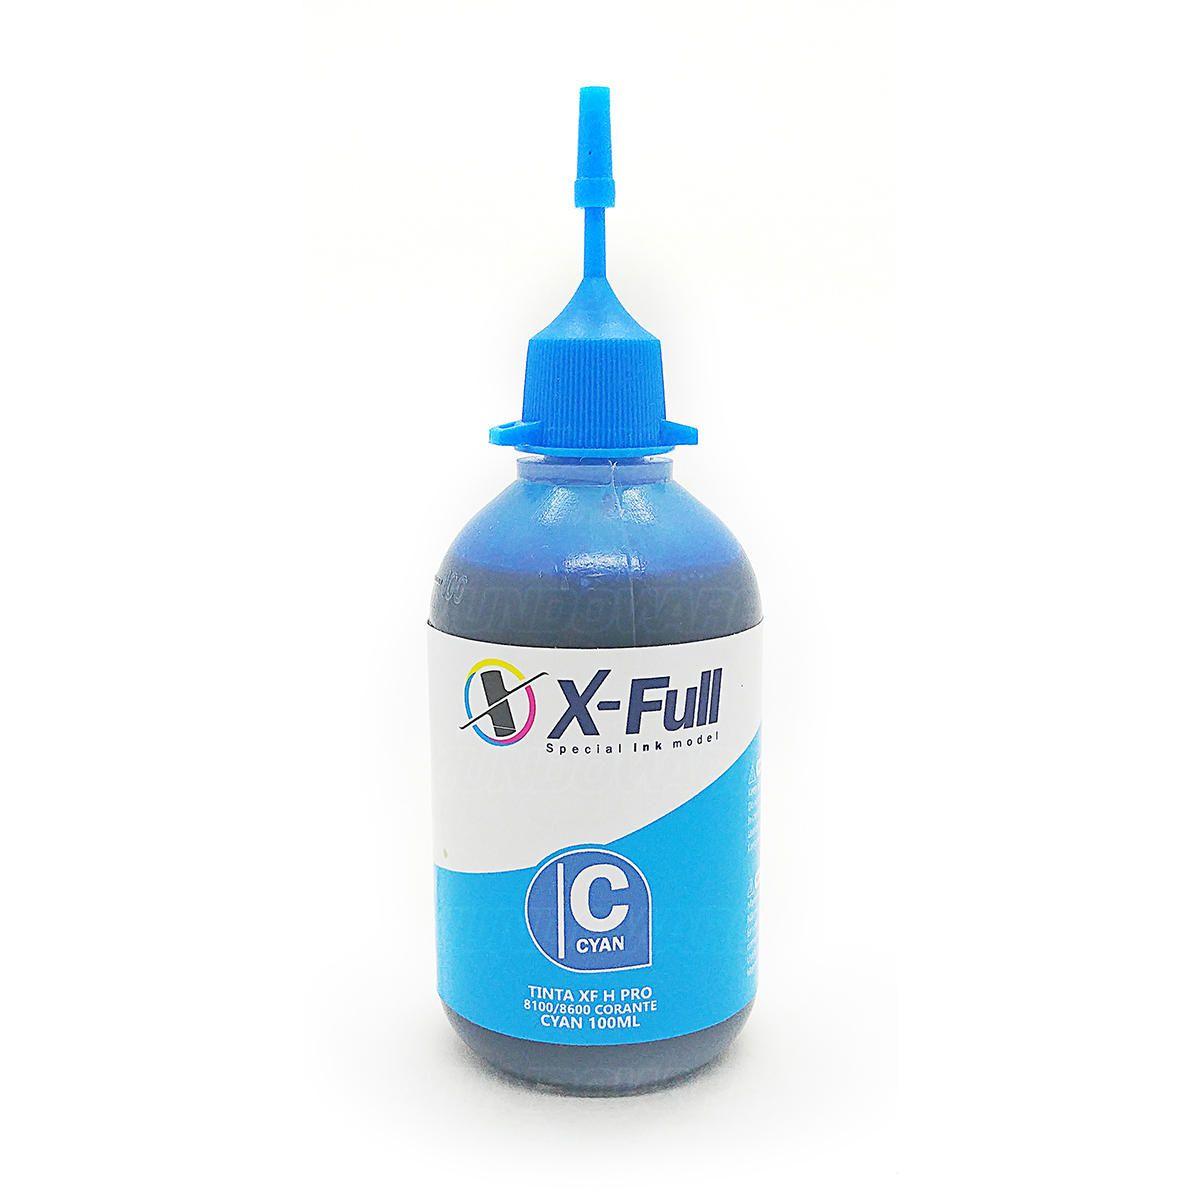 Compatível: Tinta Corante X-Full para HP 8600w 8600 8500 8100 8000 X576dw X551dw X476dw X451dw X451 / Ciano / 100ml